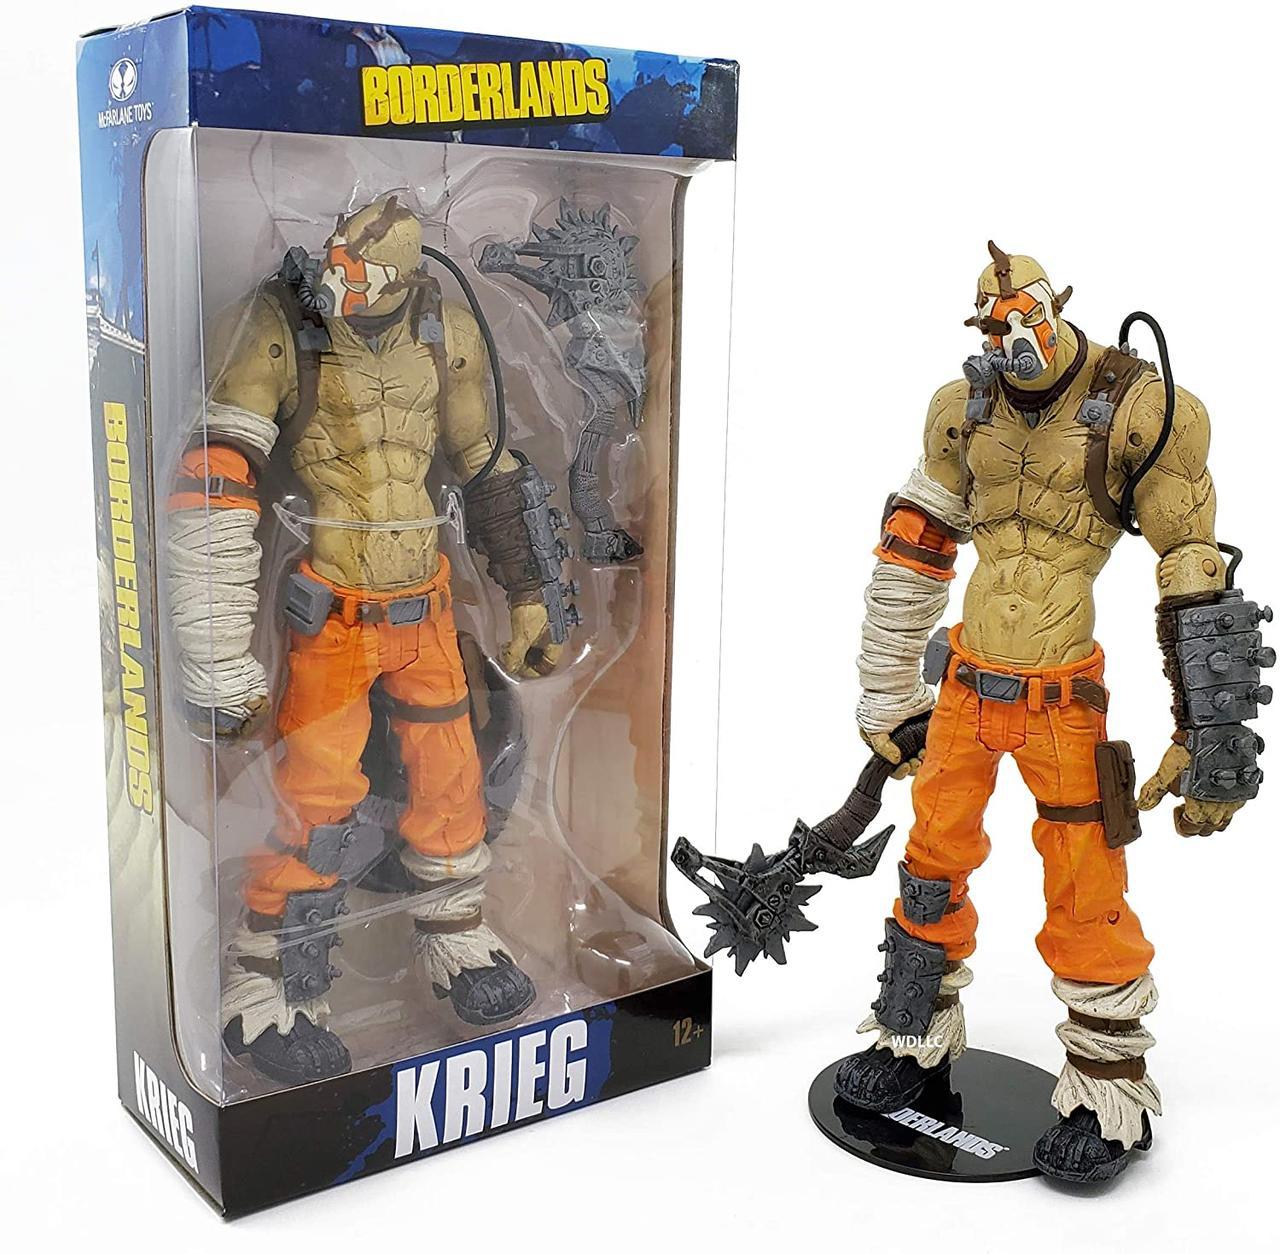 Фигурка бандита Крига McFarlane Toys Borderlands  Krieg Action Figure